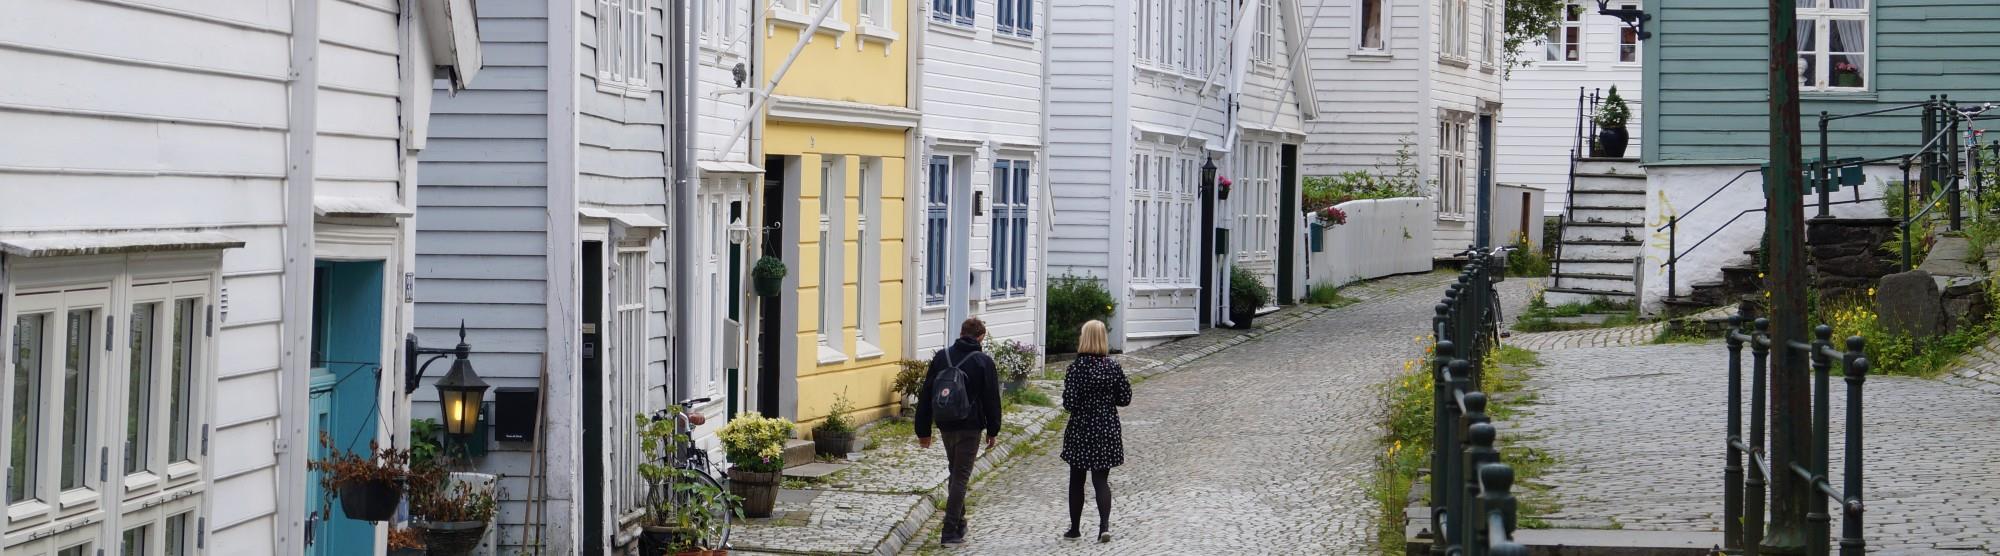 Self catering in Bergen